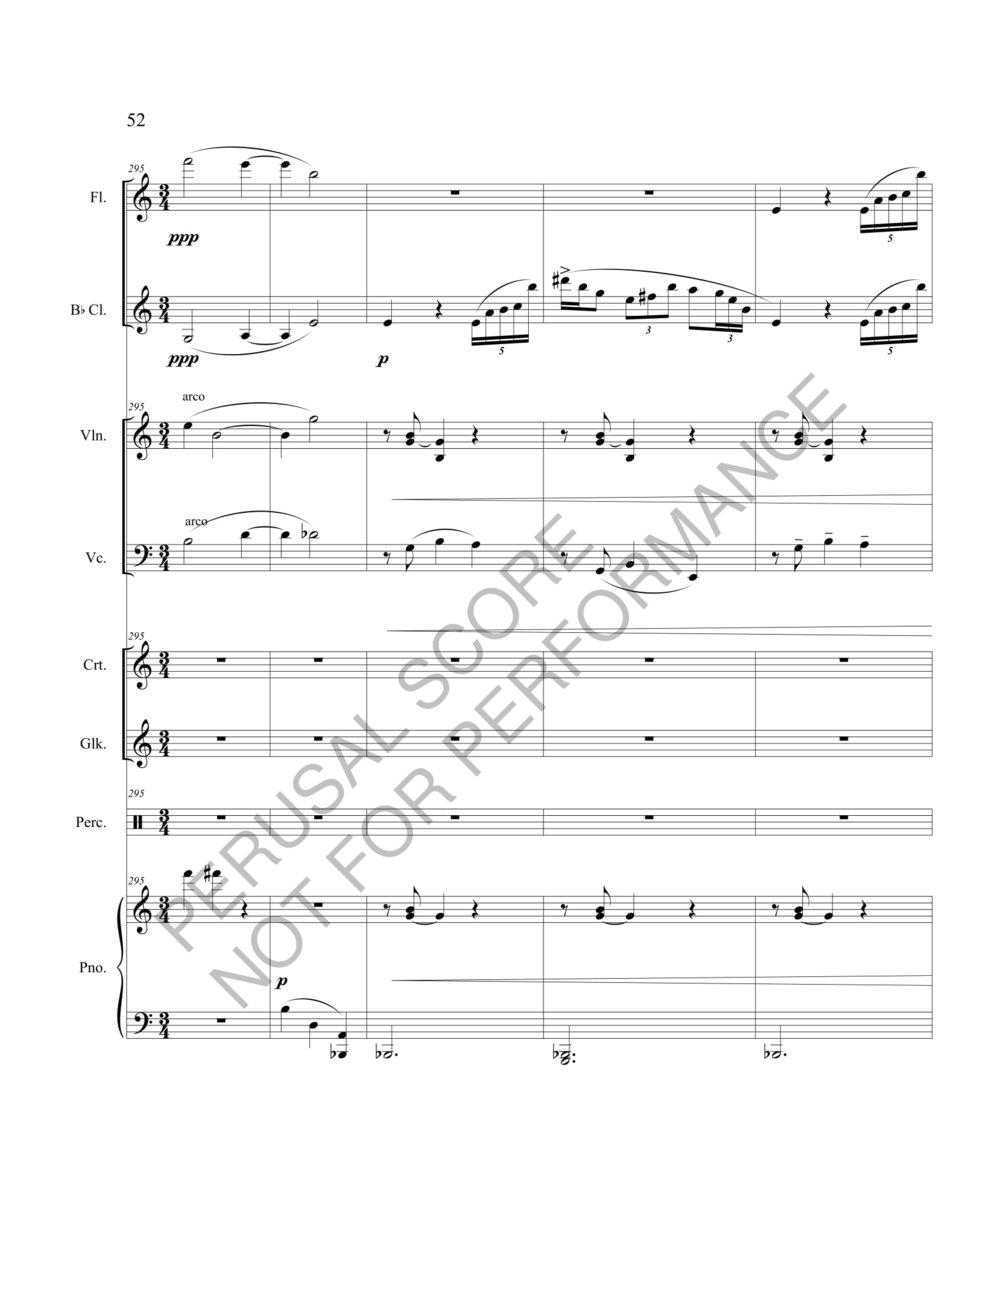 Boyd Terra Liberi Score-watermark-58.jpg